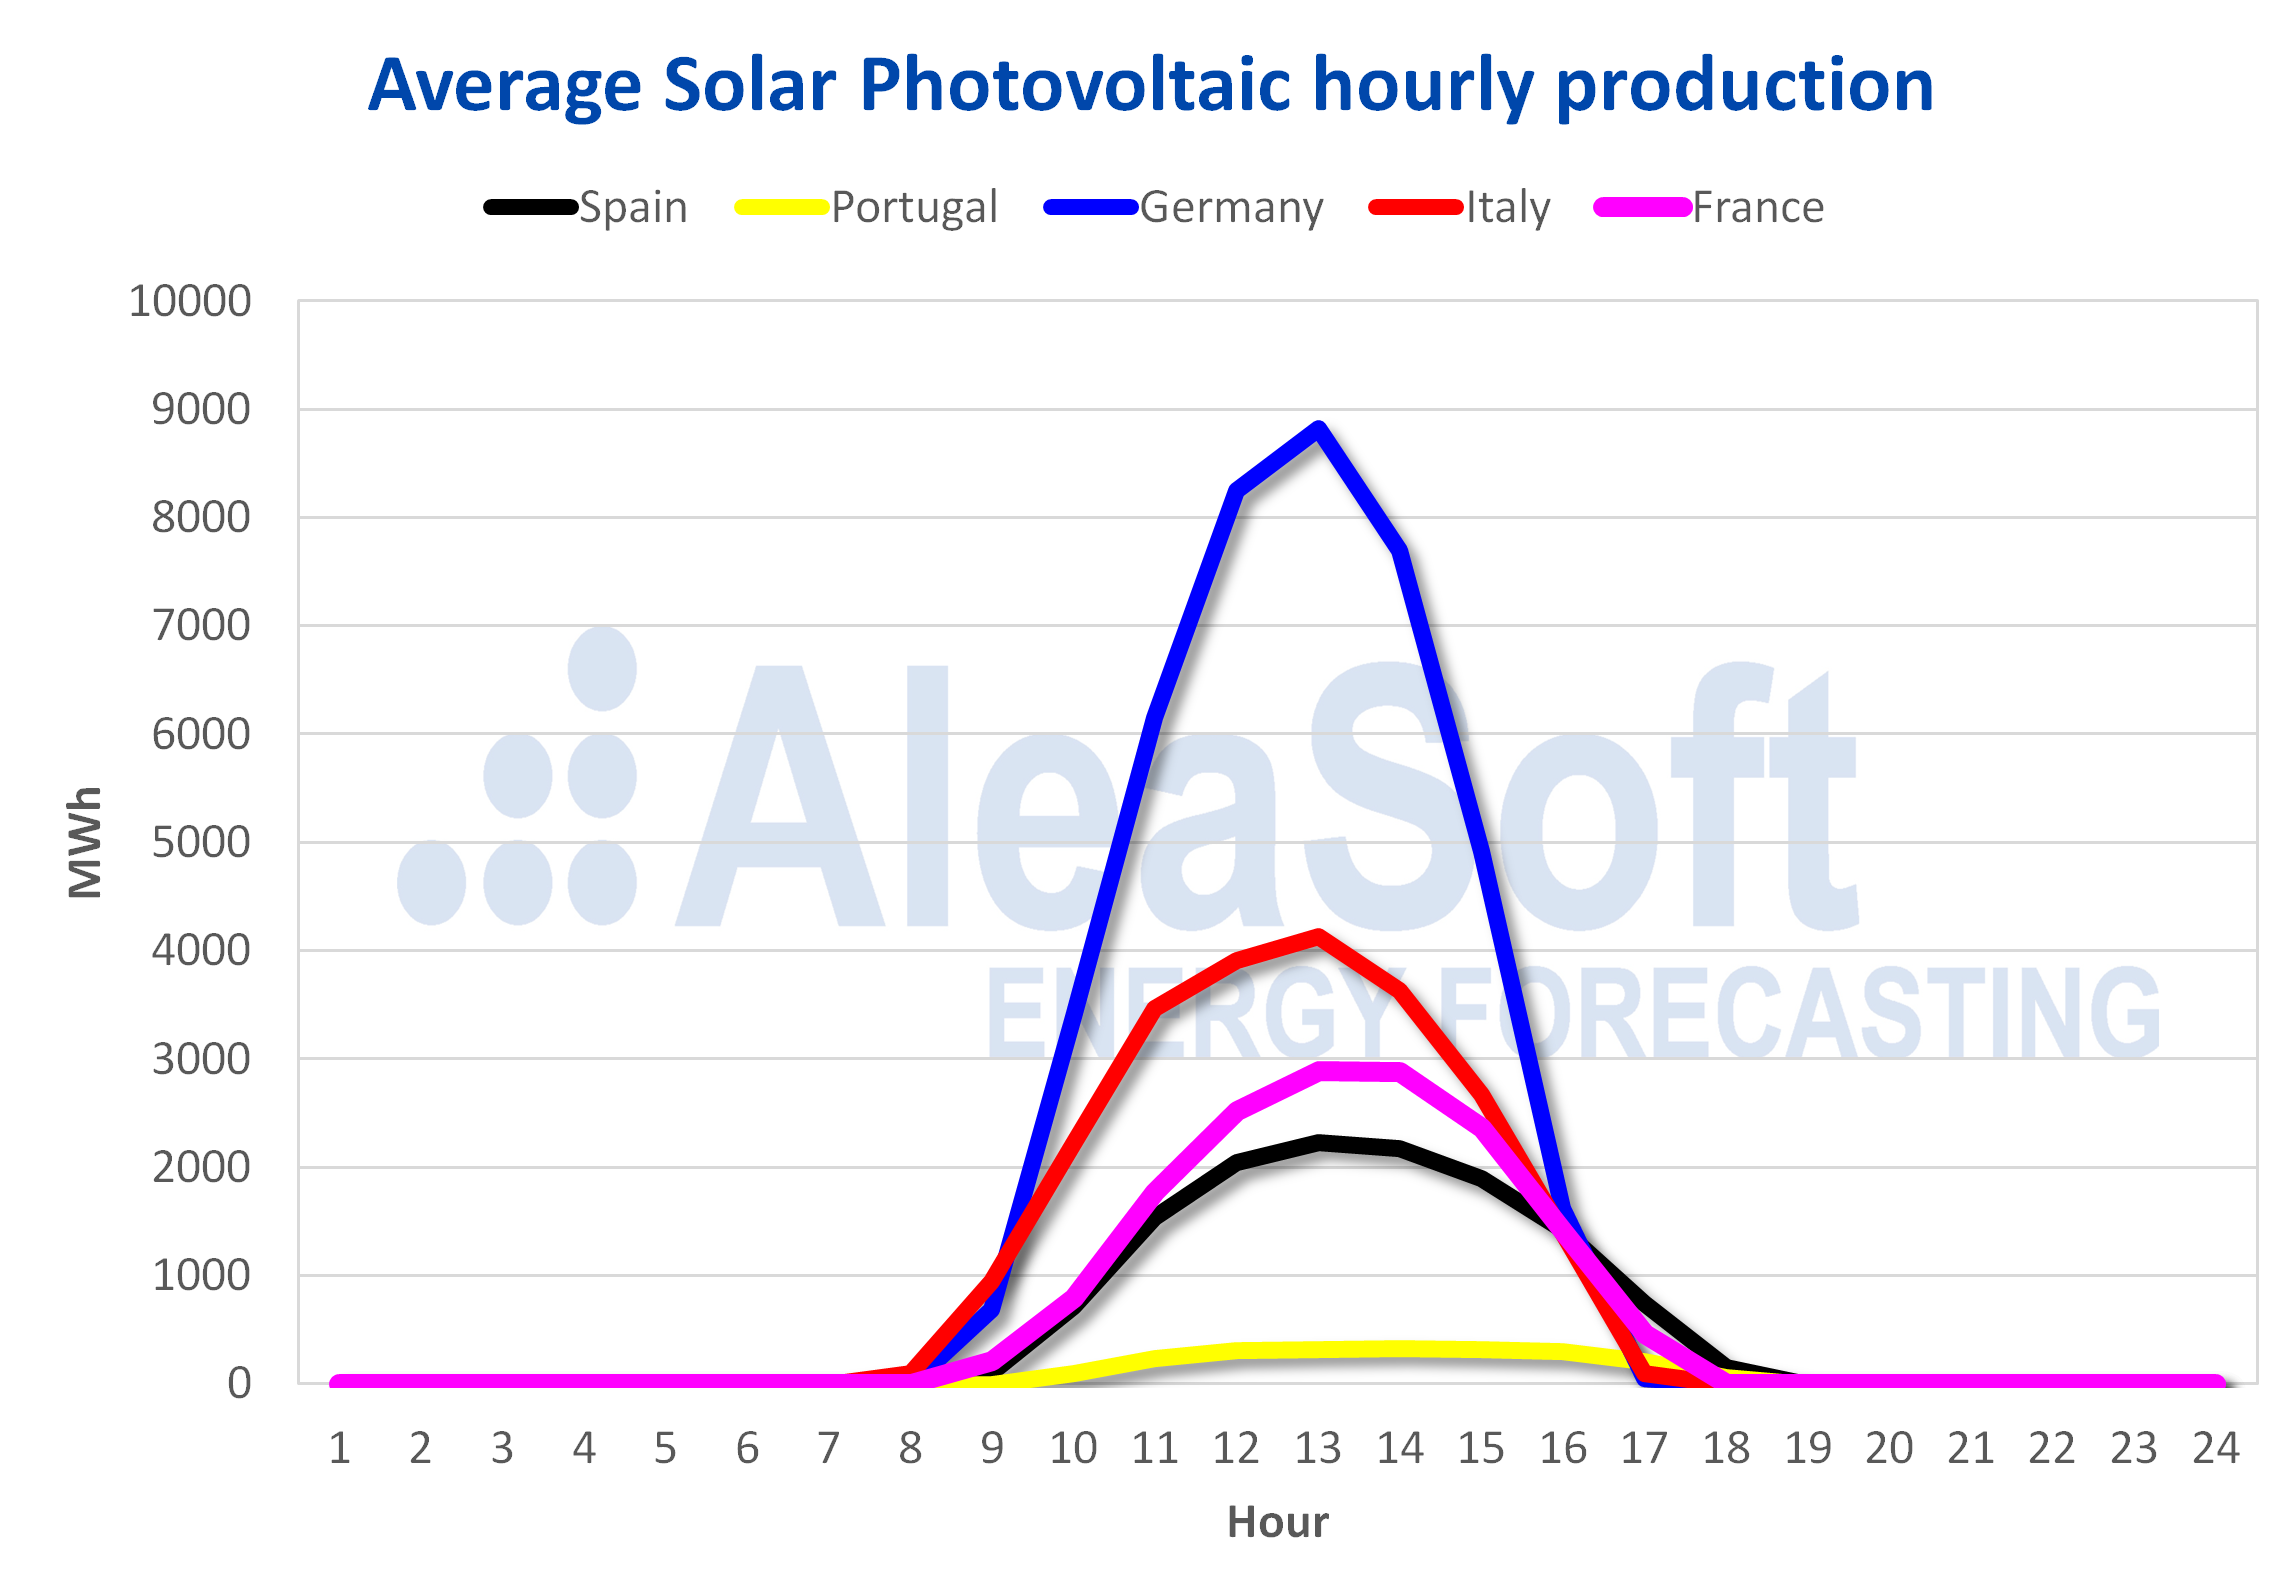 AleaSoft - Solar photovoltaic production profile